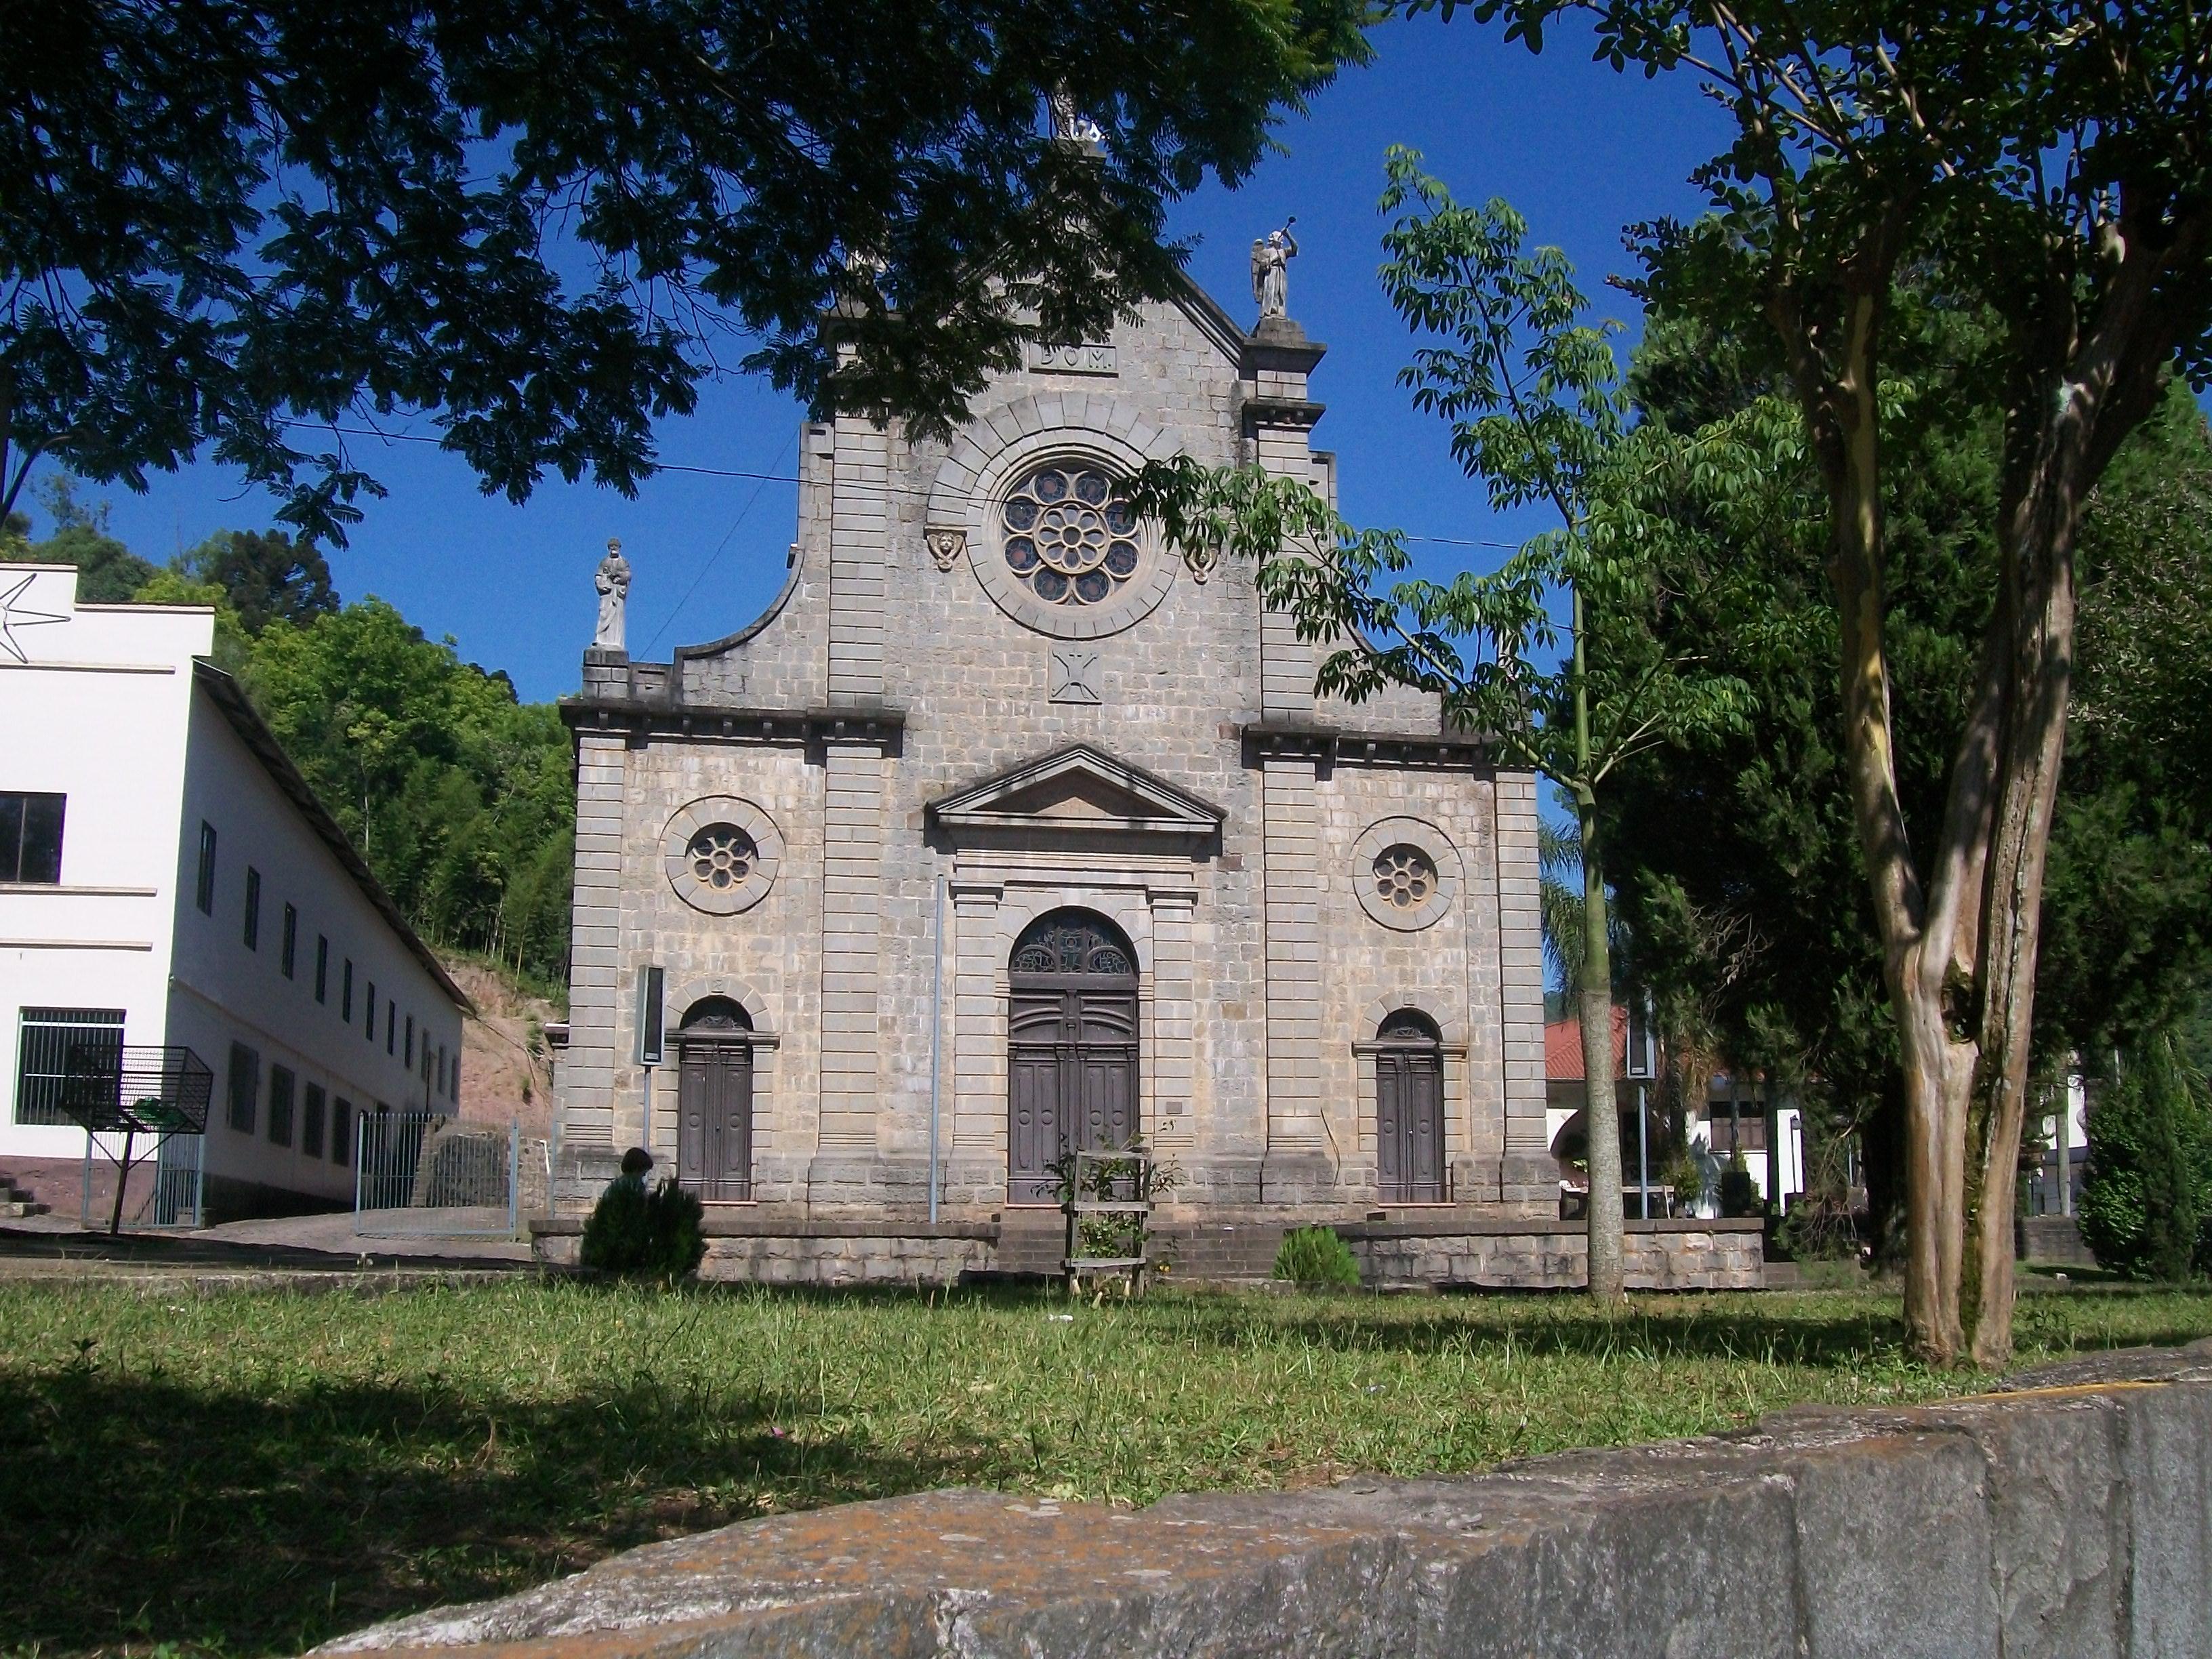 Nova Bréscia Rio Grande do Sul fonte: upload.wikimedia.org